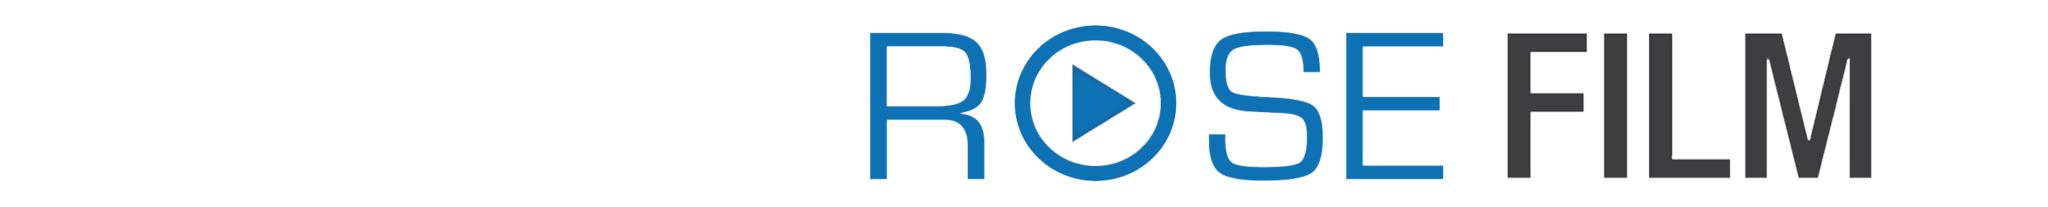 Rose Film Logo